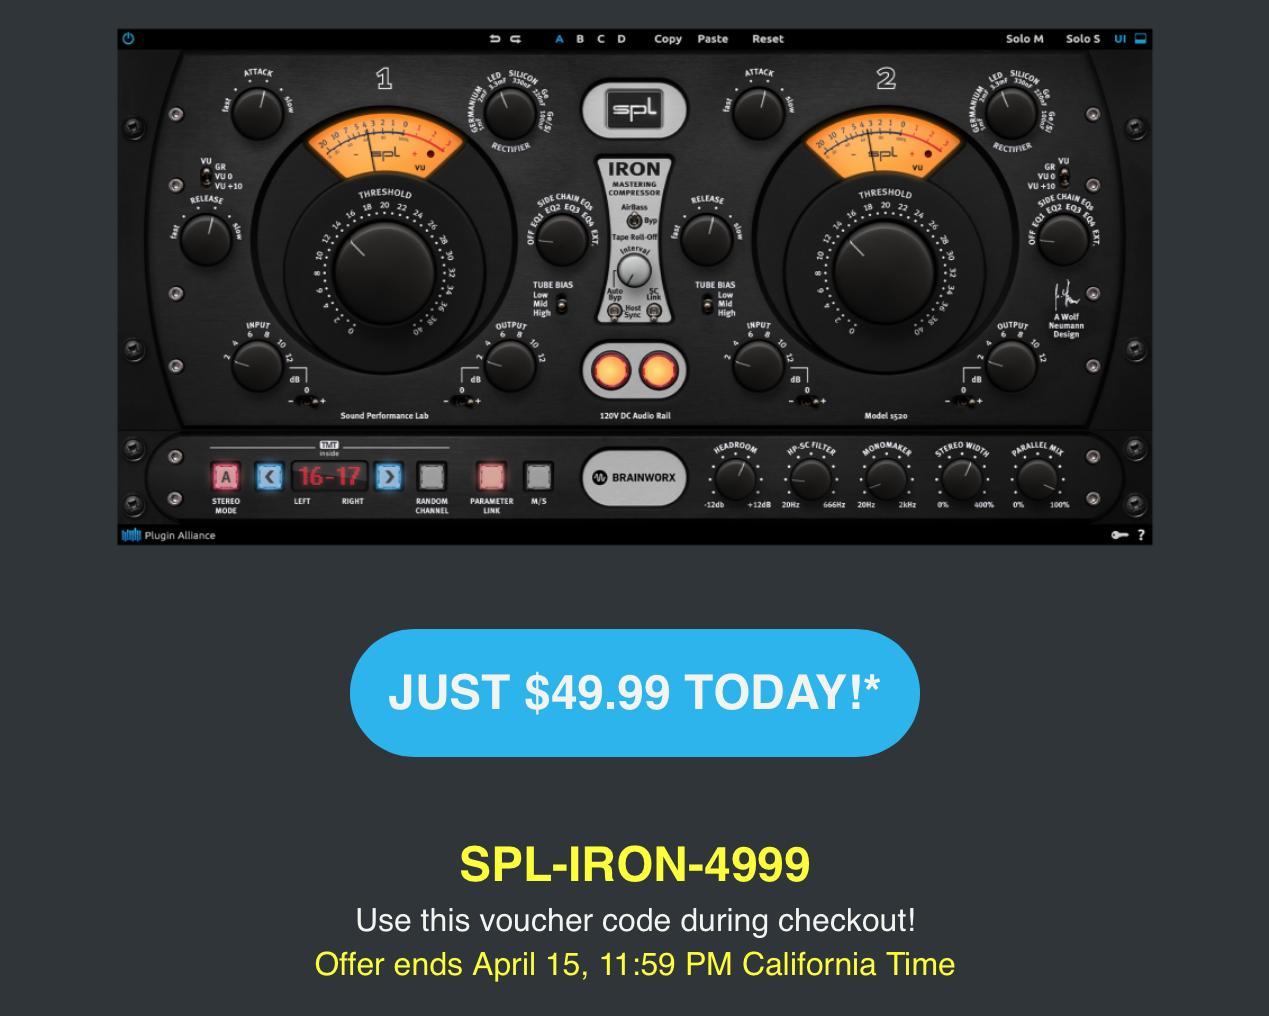 SPL-IRON-4999.png.jpg